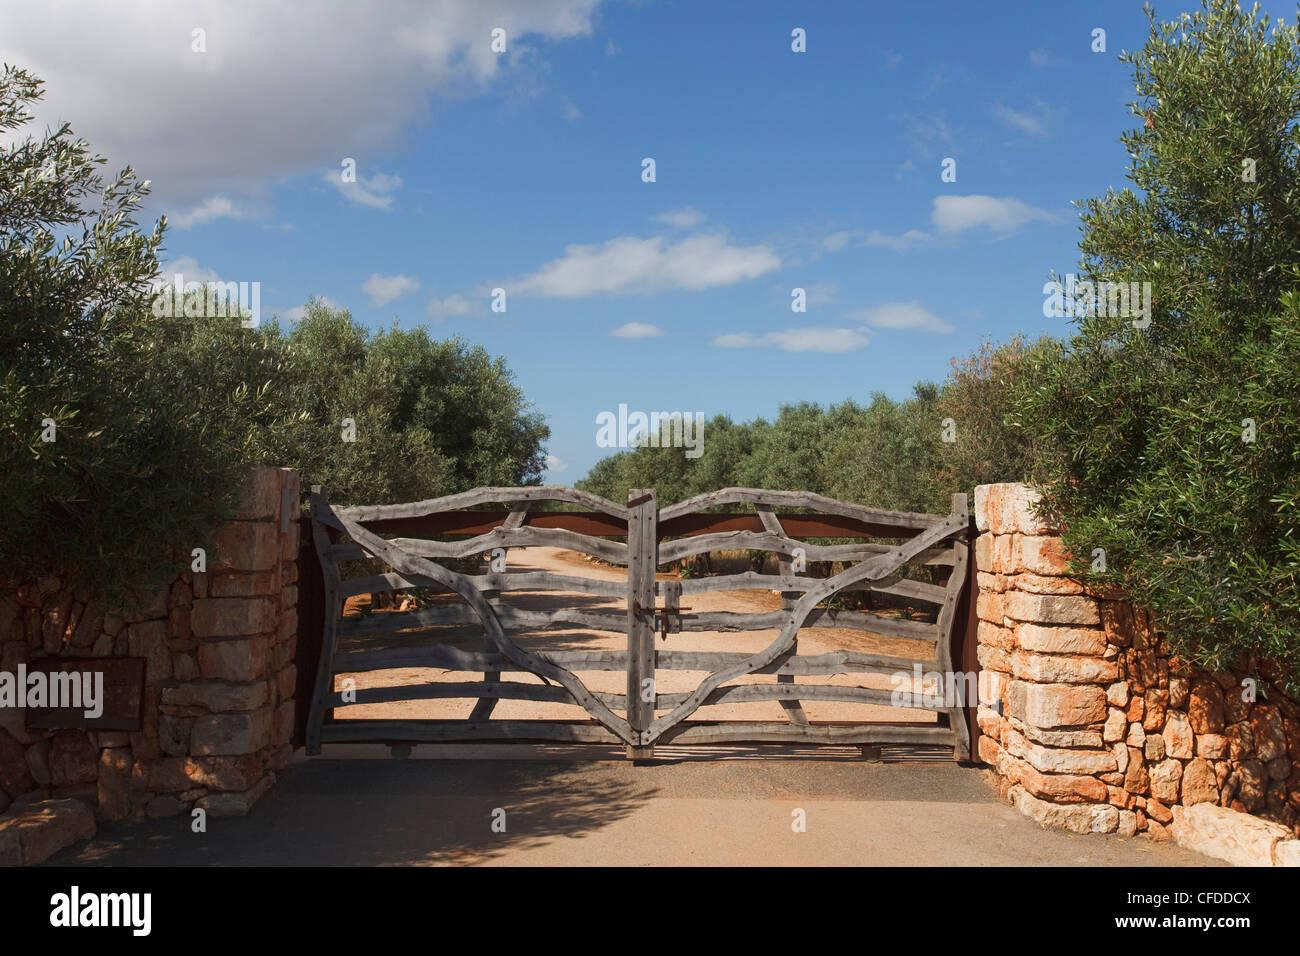 Gate, olive trees, near Cala Sa Nau, near Cala d Or, Mallorca, Balearic Islands, Spain, Europe - Stock Image